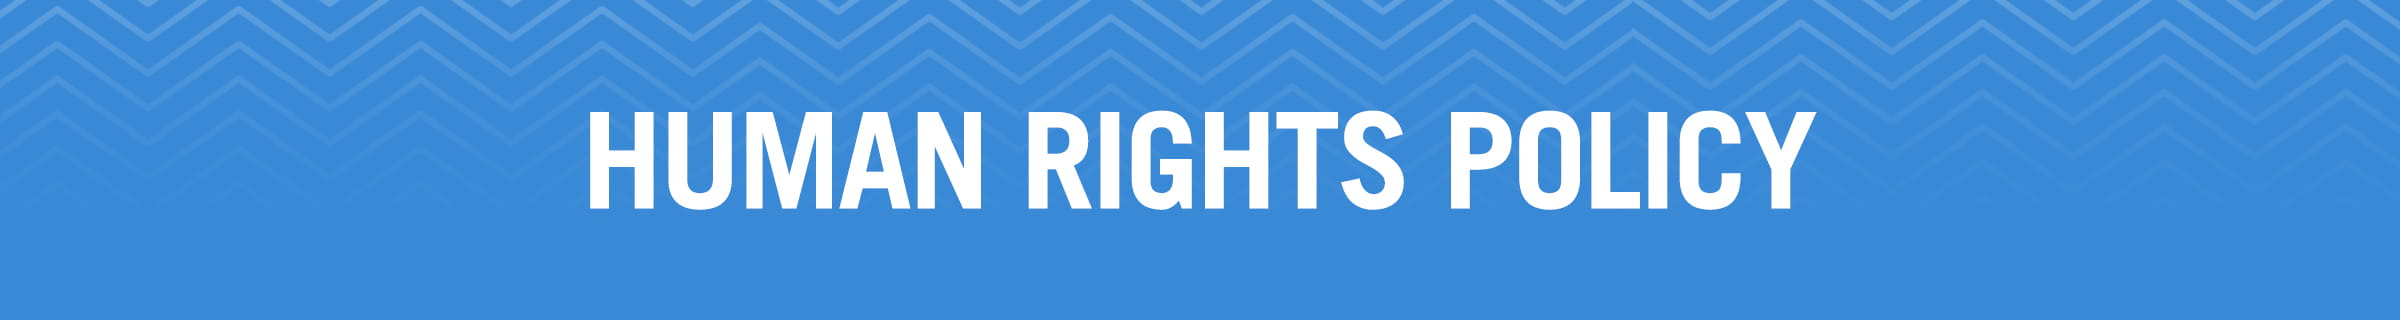 McCormick & Company Human Rights Policy